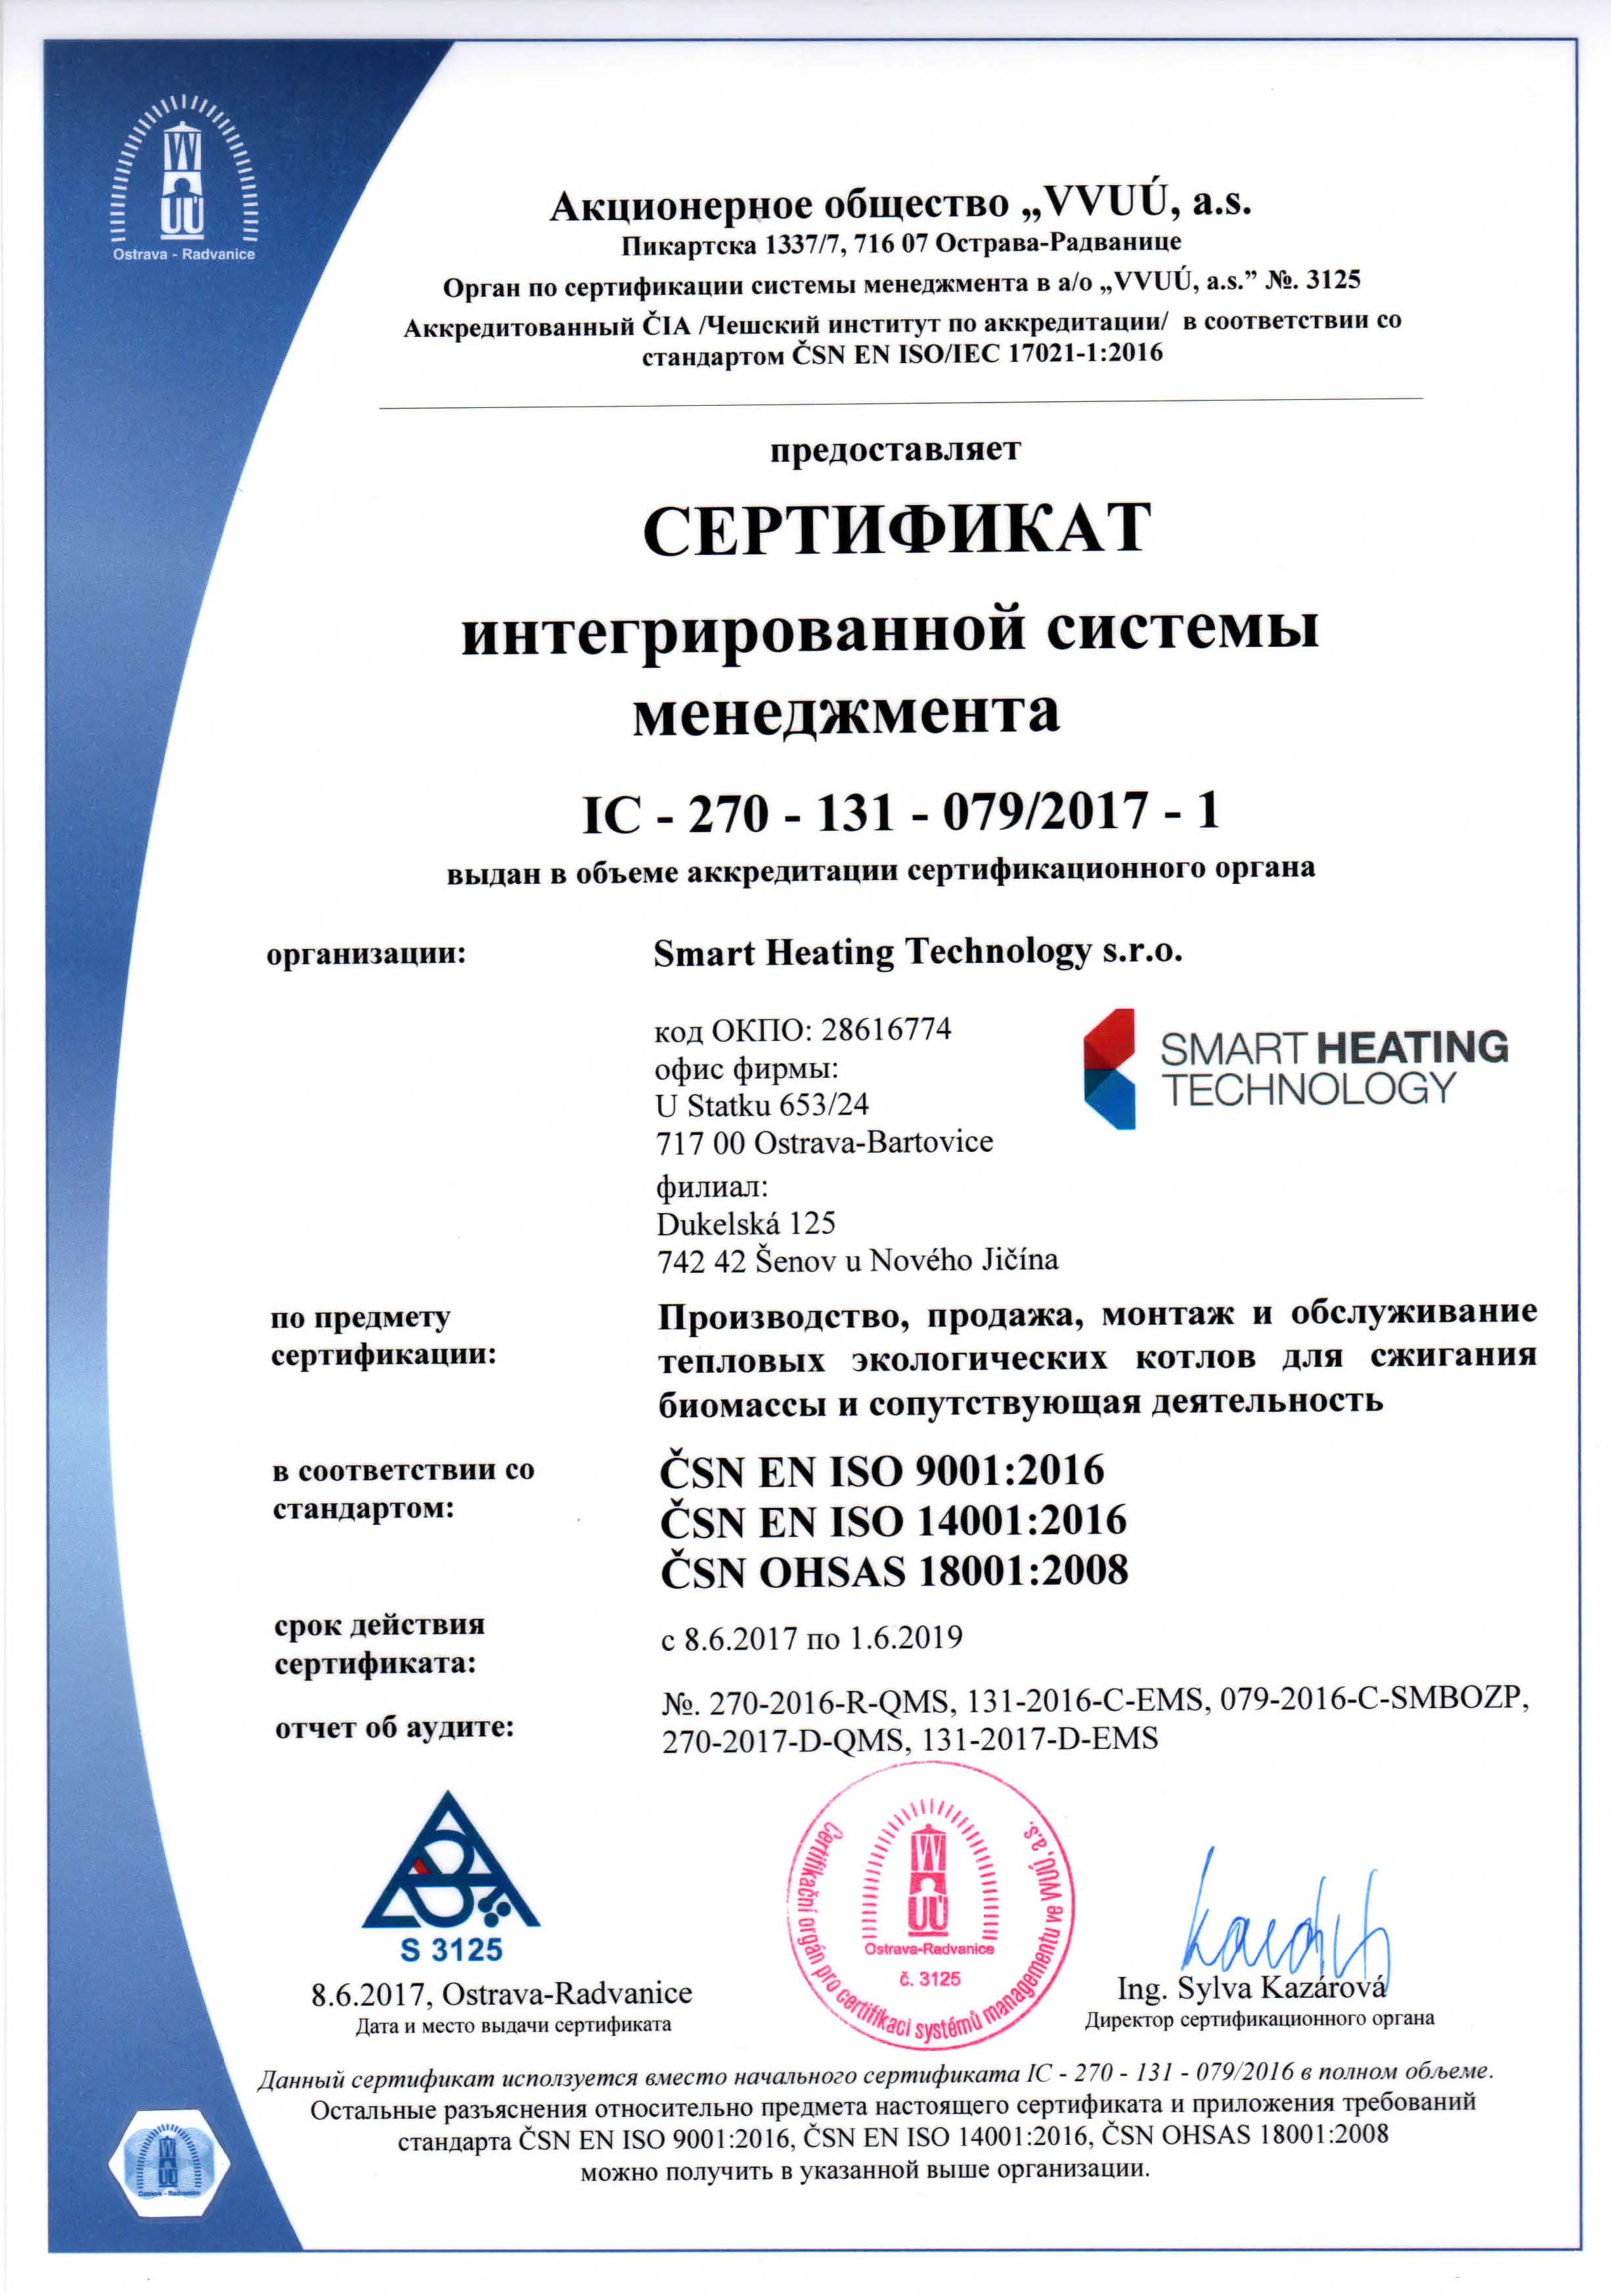 certifikat-ic-270-131-079_2017-1-ru_stranka_1